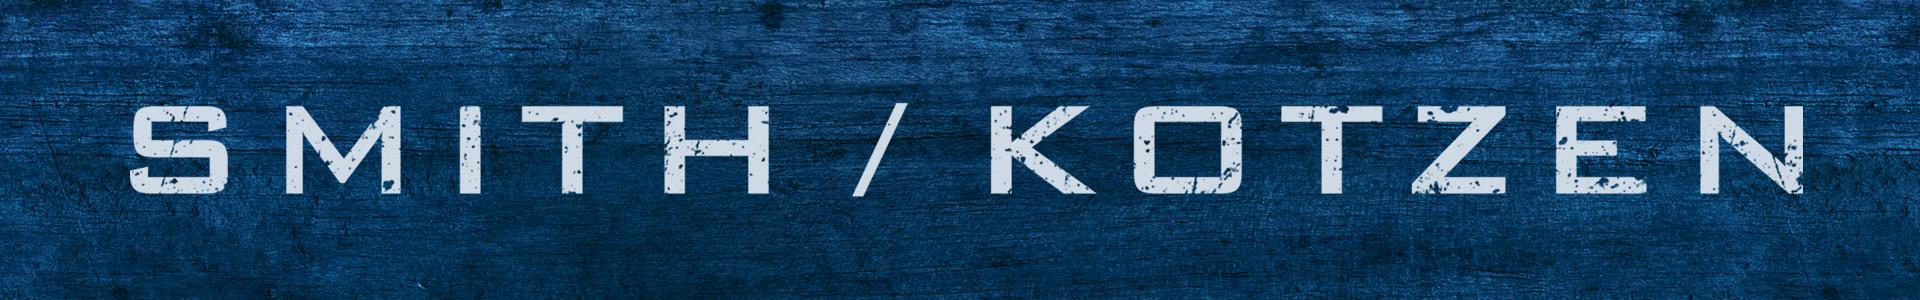 Adrian announces new collaboration with Richie Kotzen